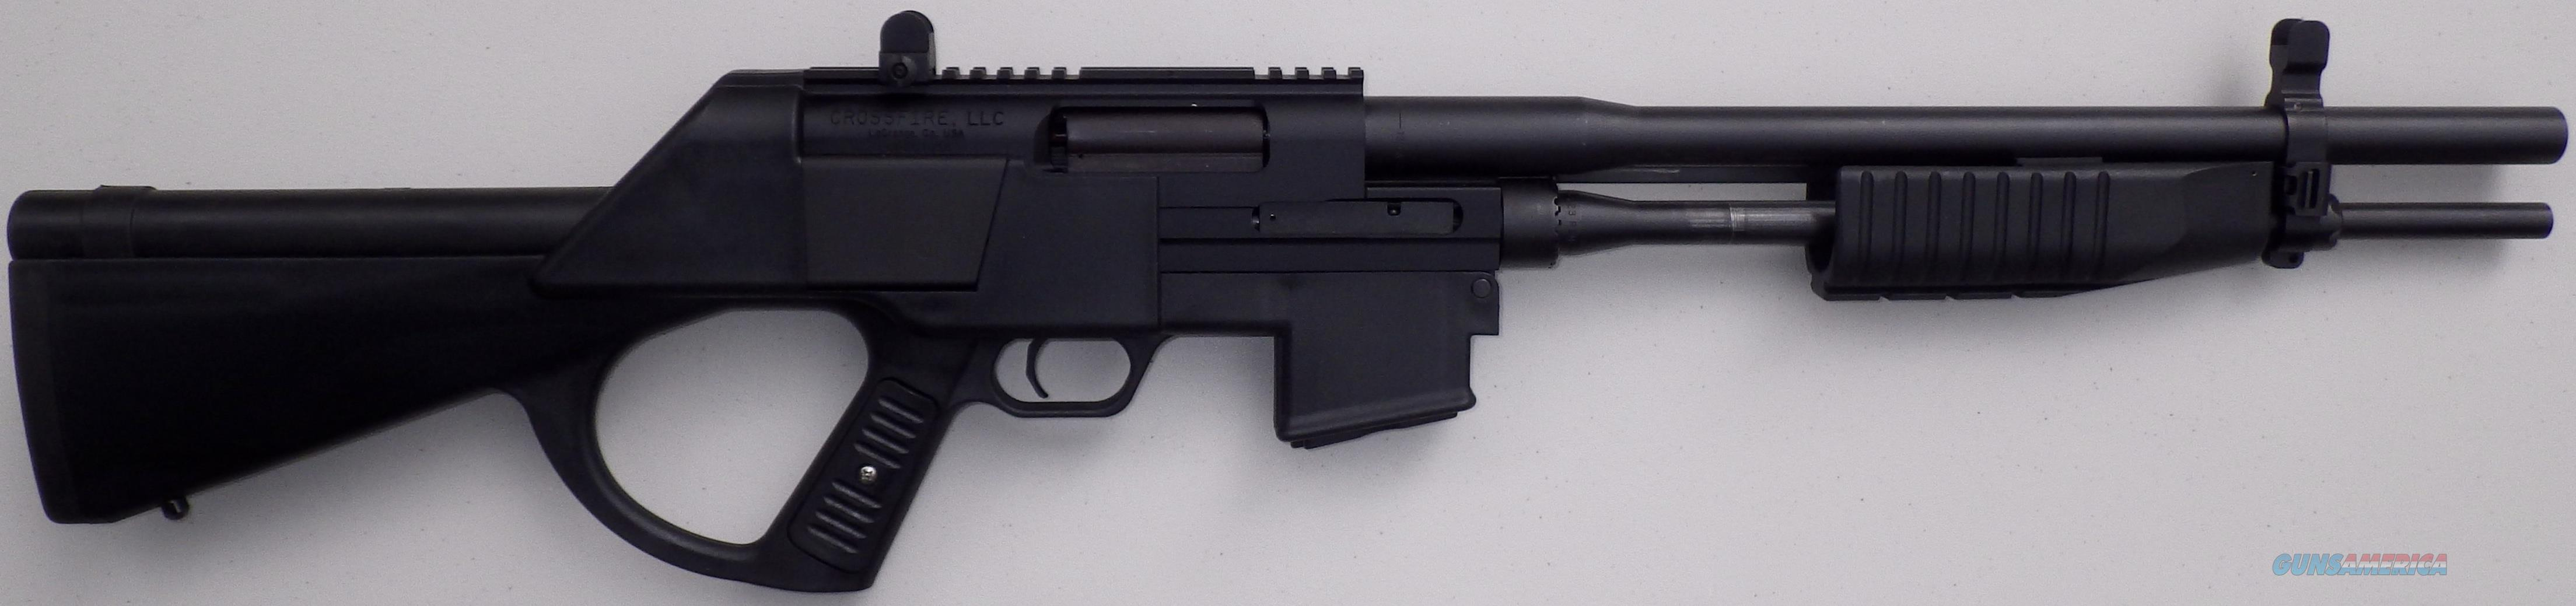 Crossfire MK-1 12 gauge / .223 Rem combo pump a... for sale